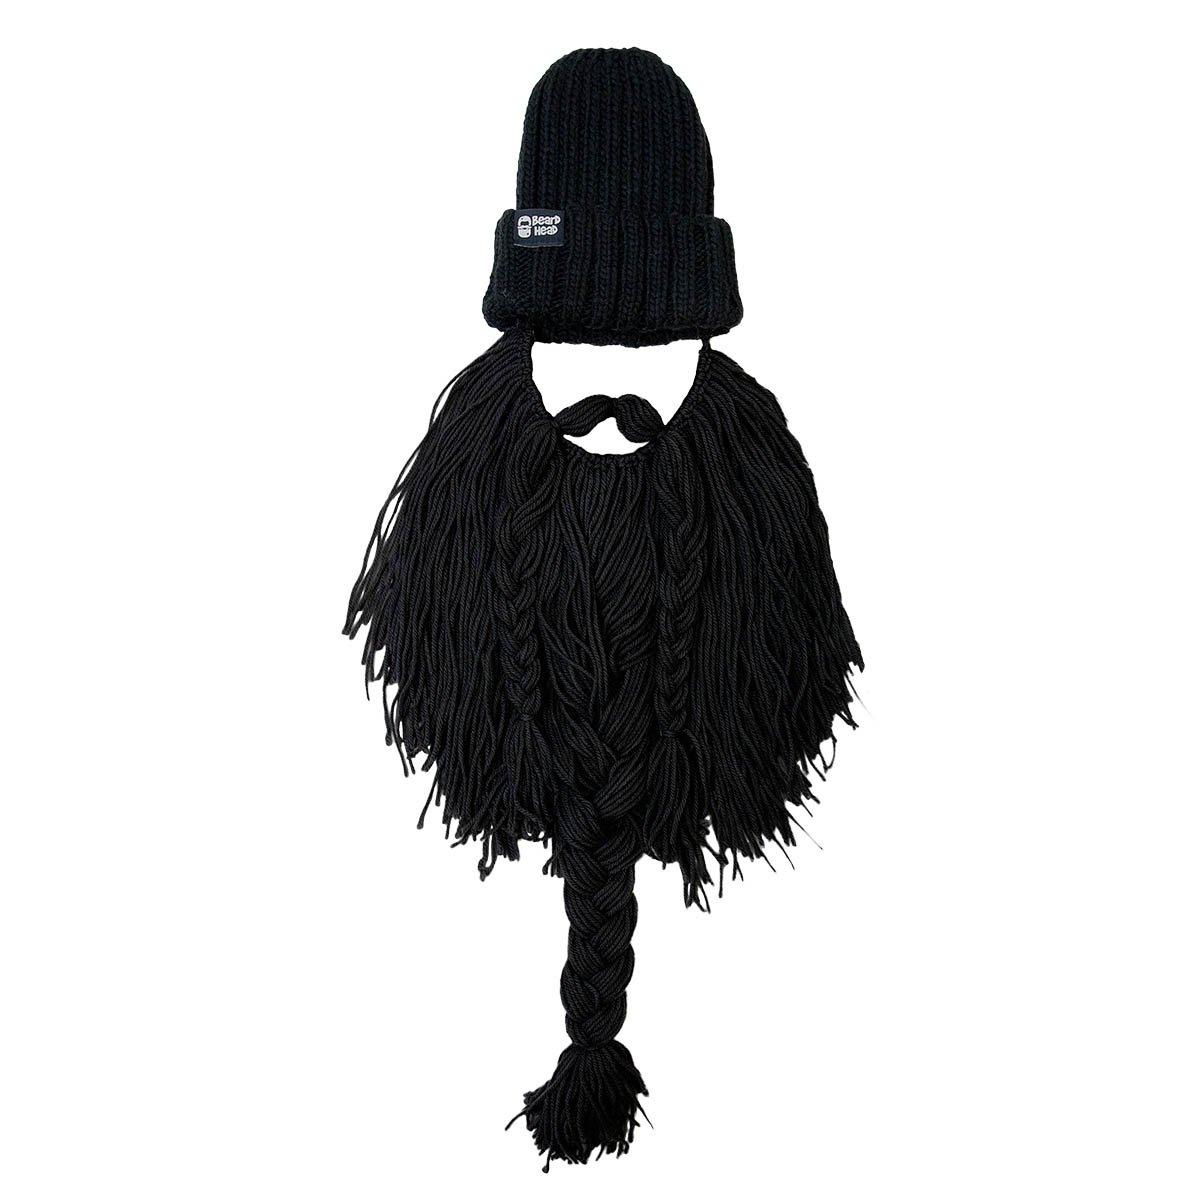 5a50eae0dec Amazon.com  Beard Head Barbarian Roadie Beard Beanie -Funny Knit Hat and  Fake Beard Facemask Black  Clothing